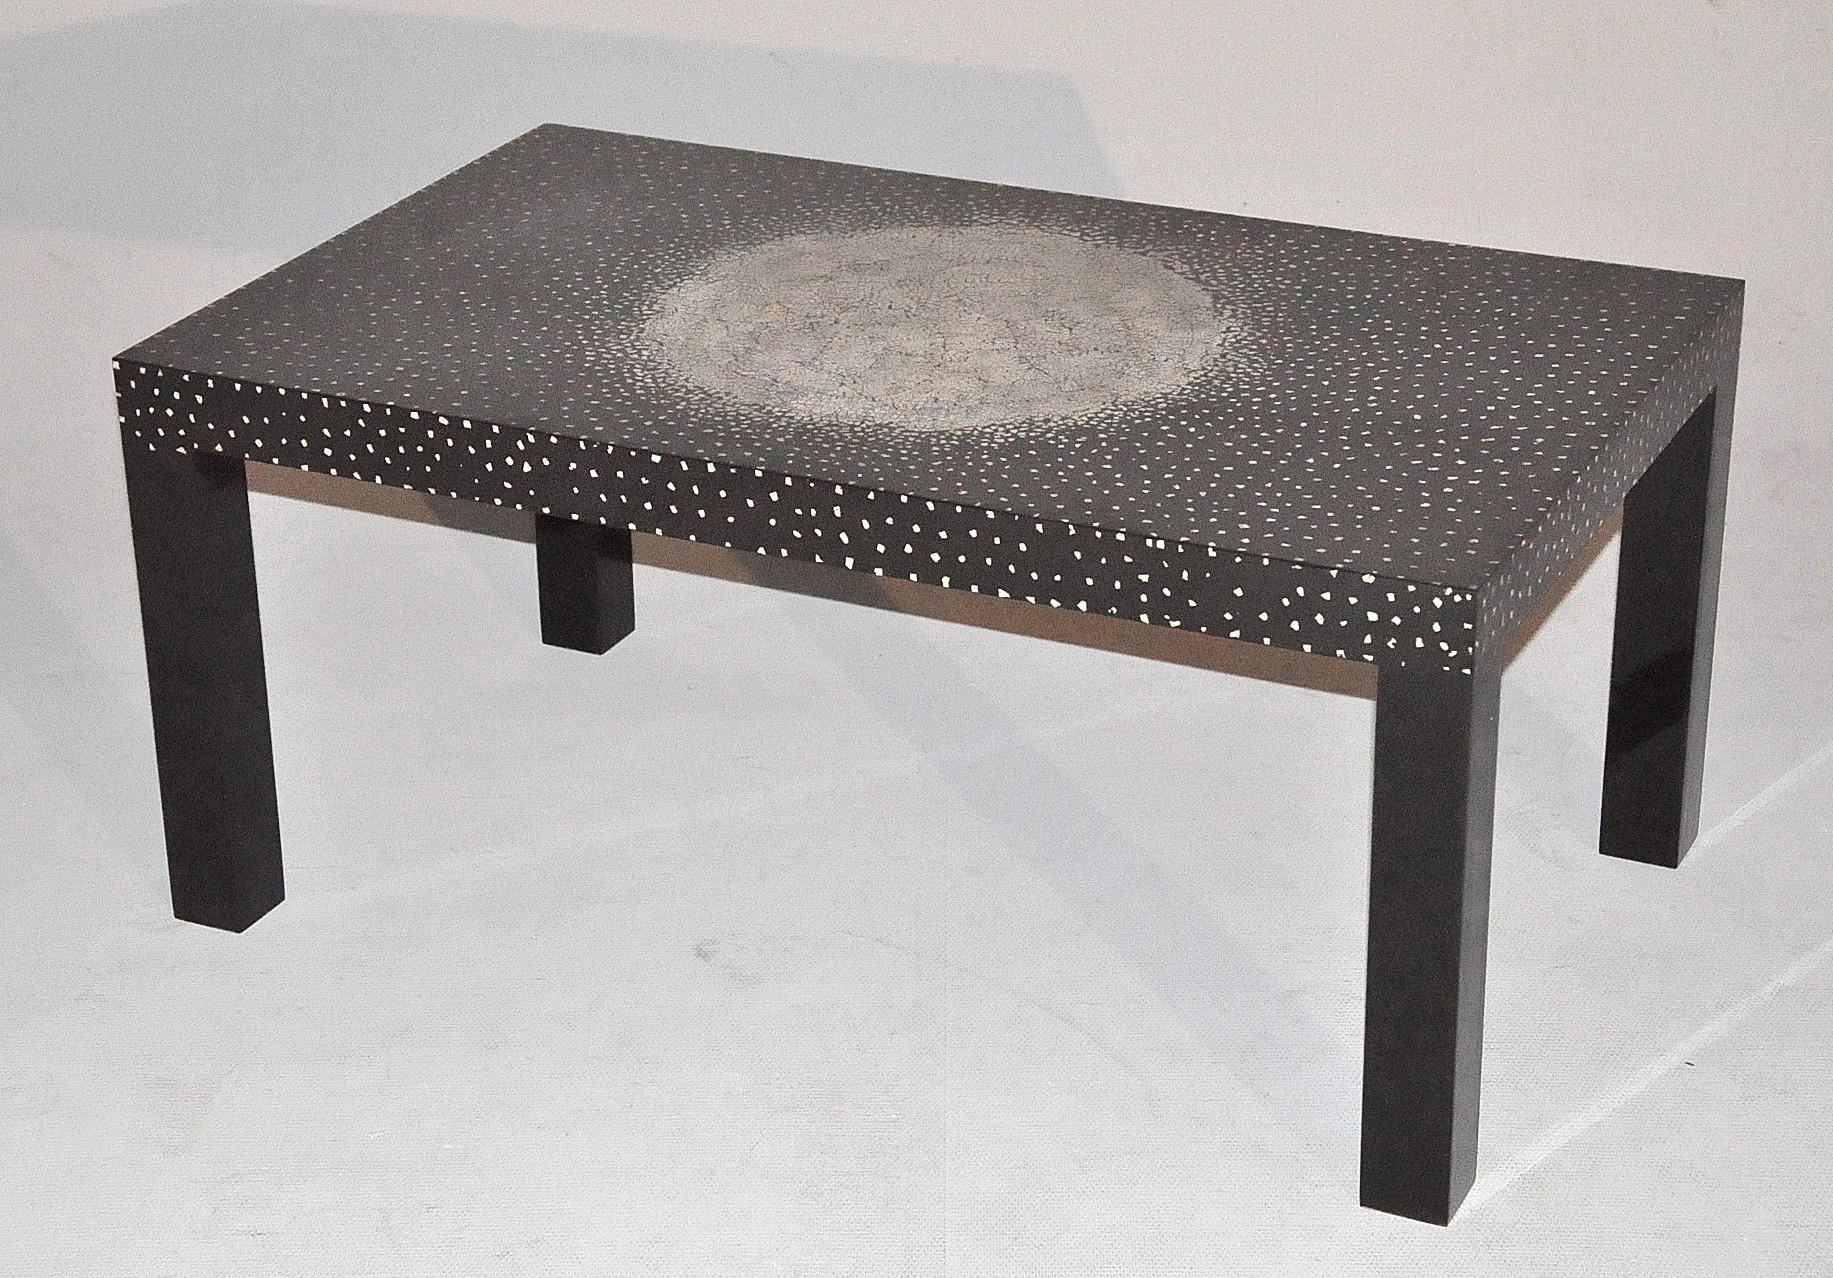 table basse rectangulaire laque noire et coquille d 39 oeuf. Black Bedroom Furniture Sets. Home Design Ideas